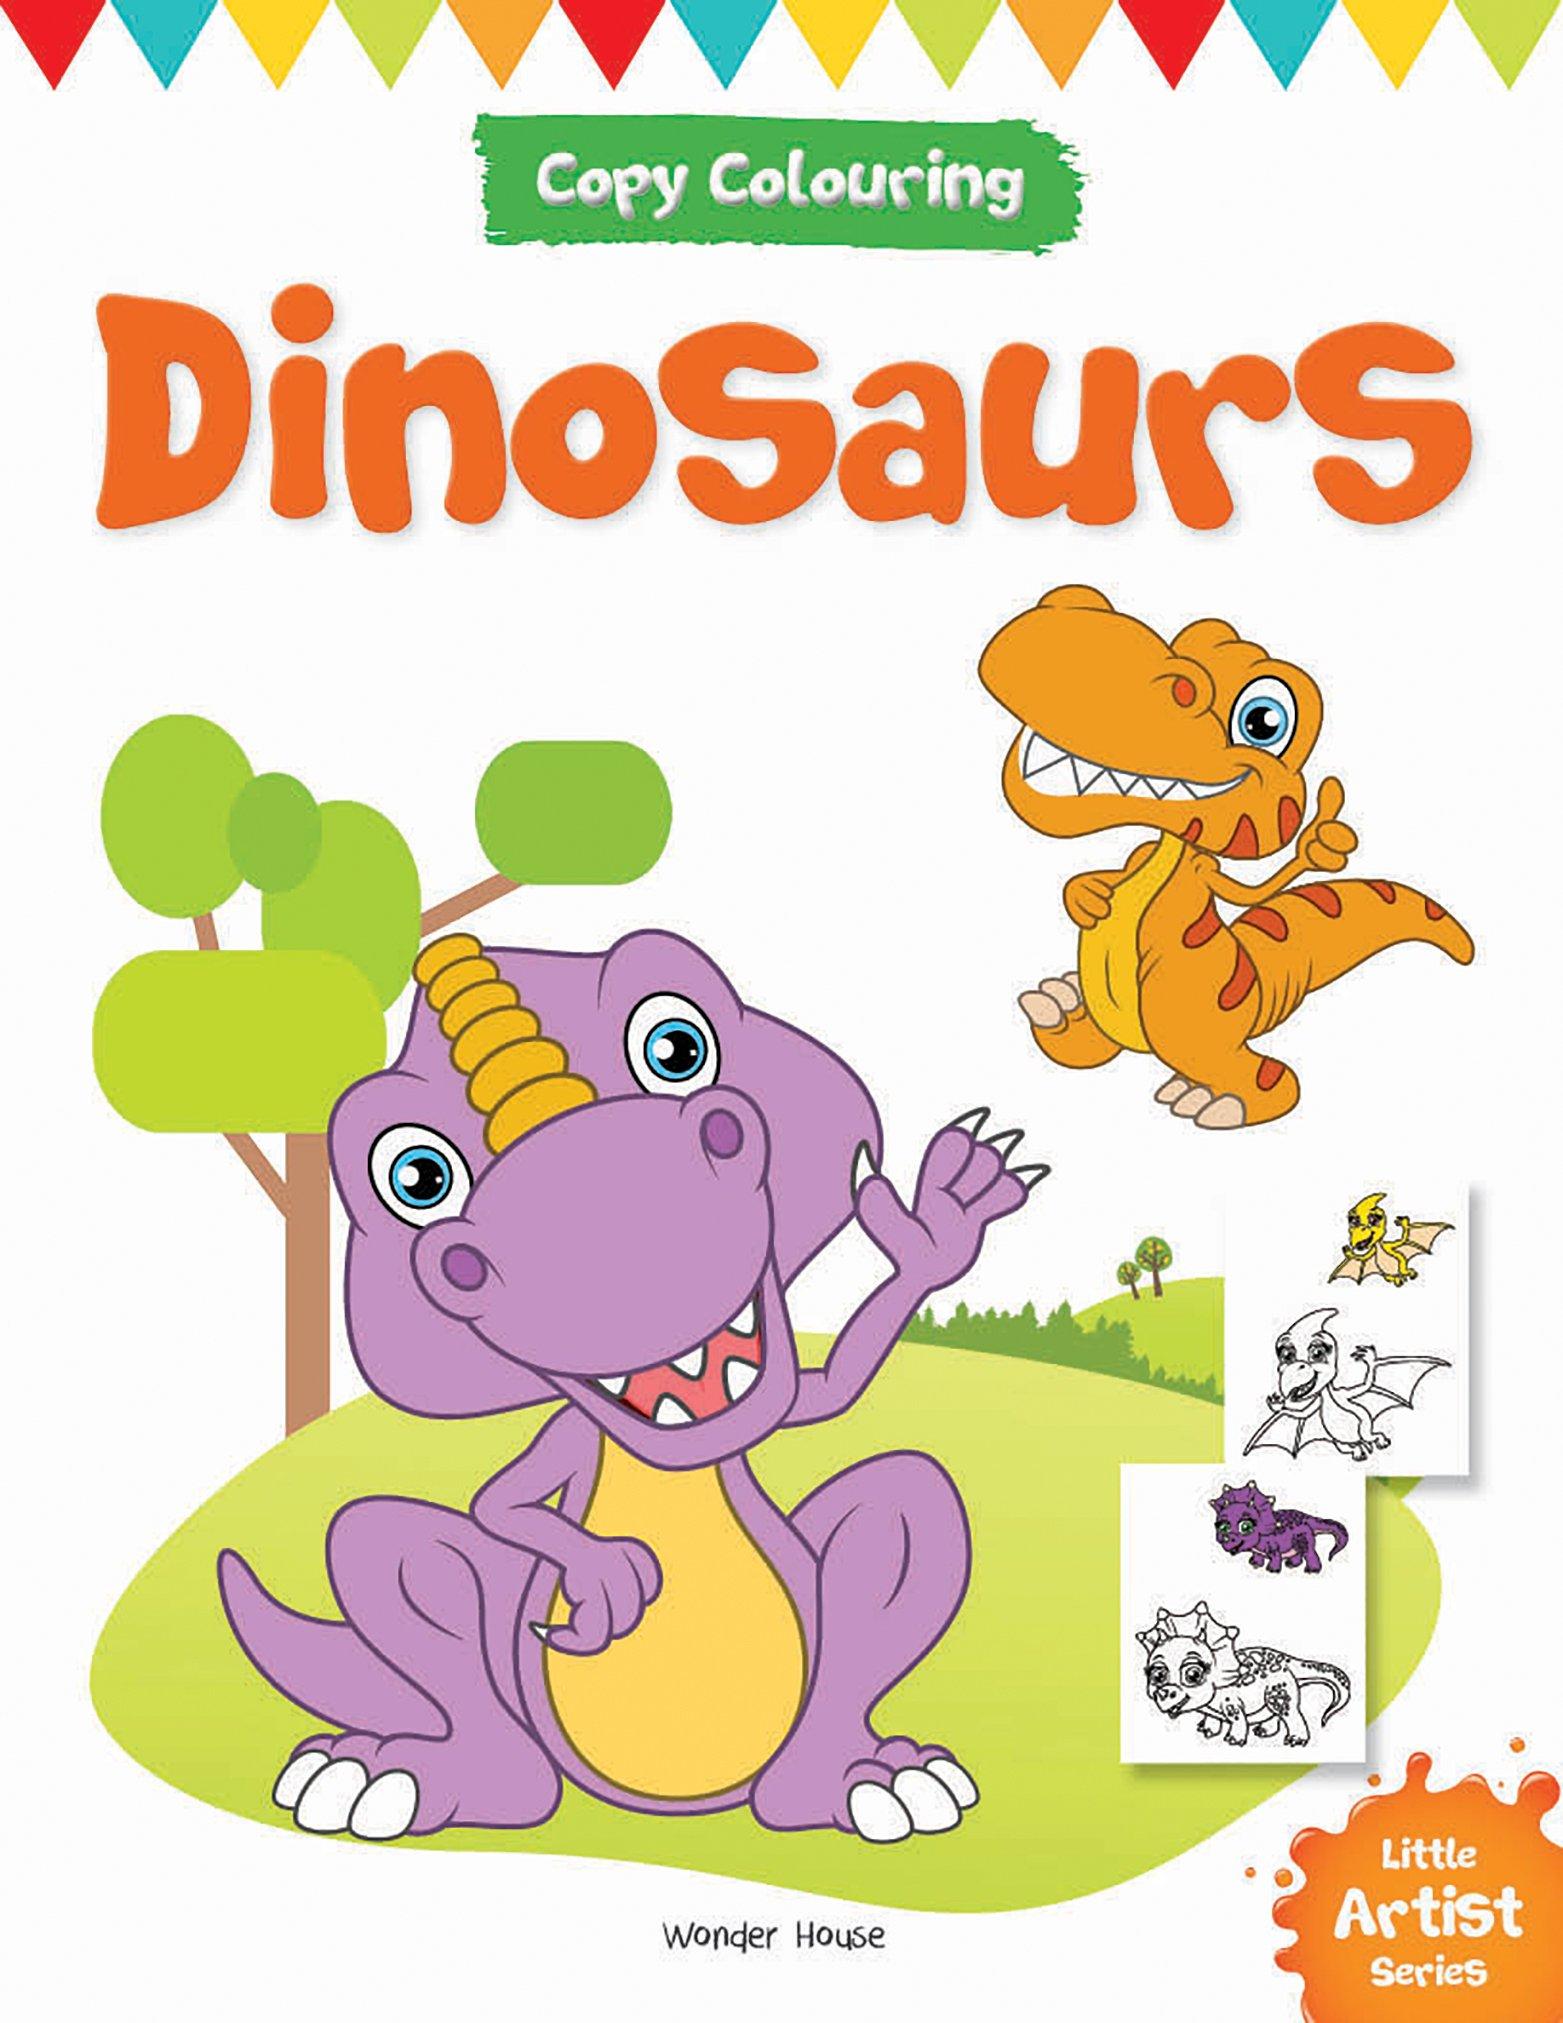 Little Artist Series - Dinosaurs : Copy Colouring Books